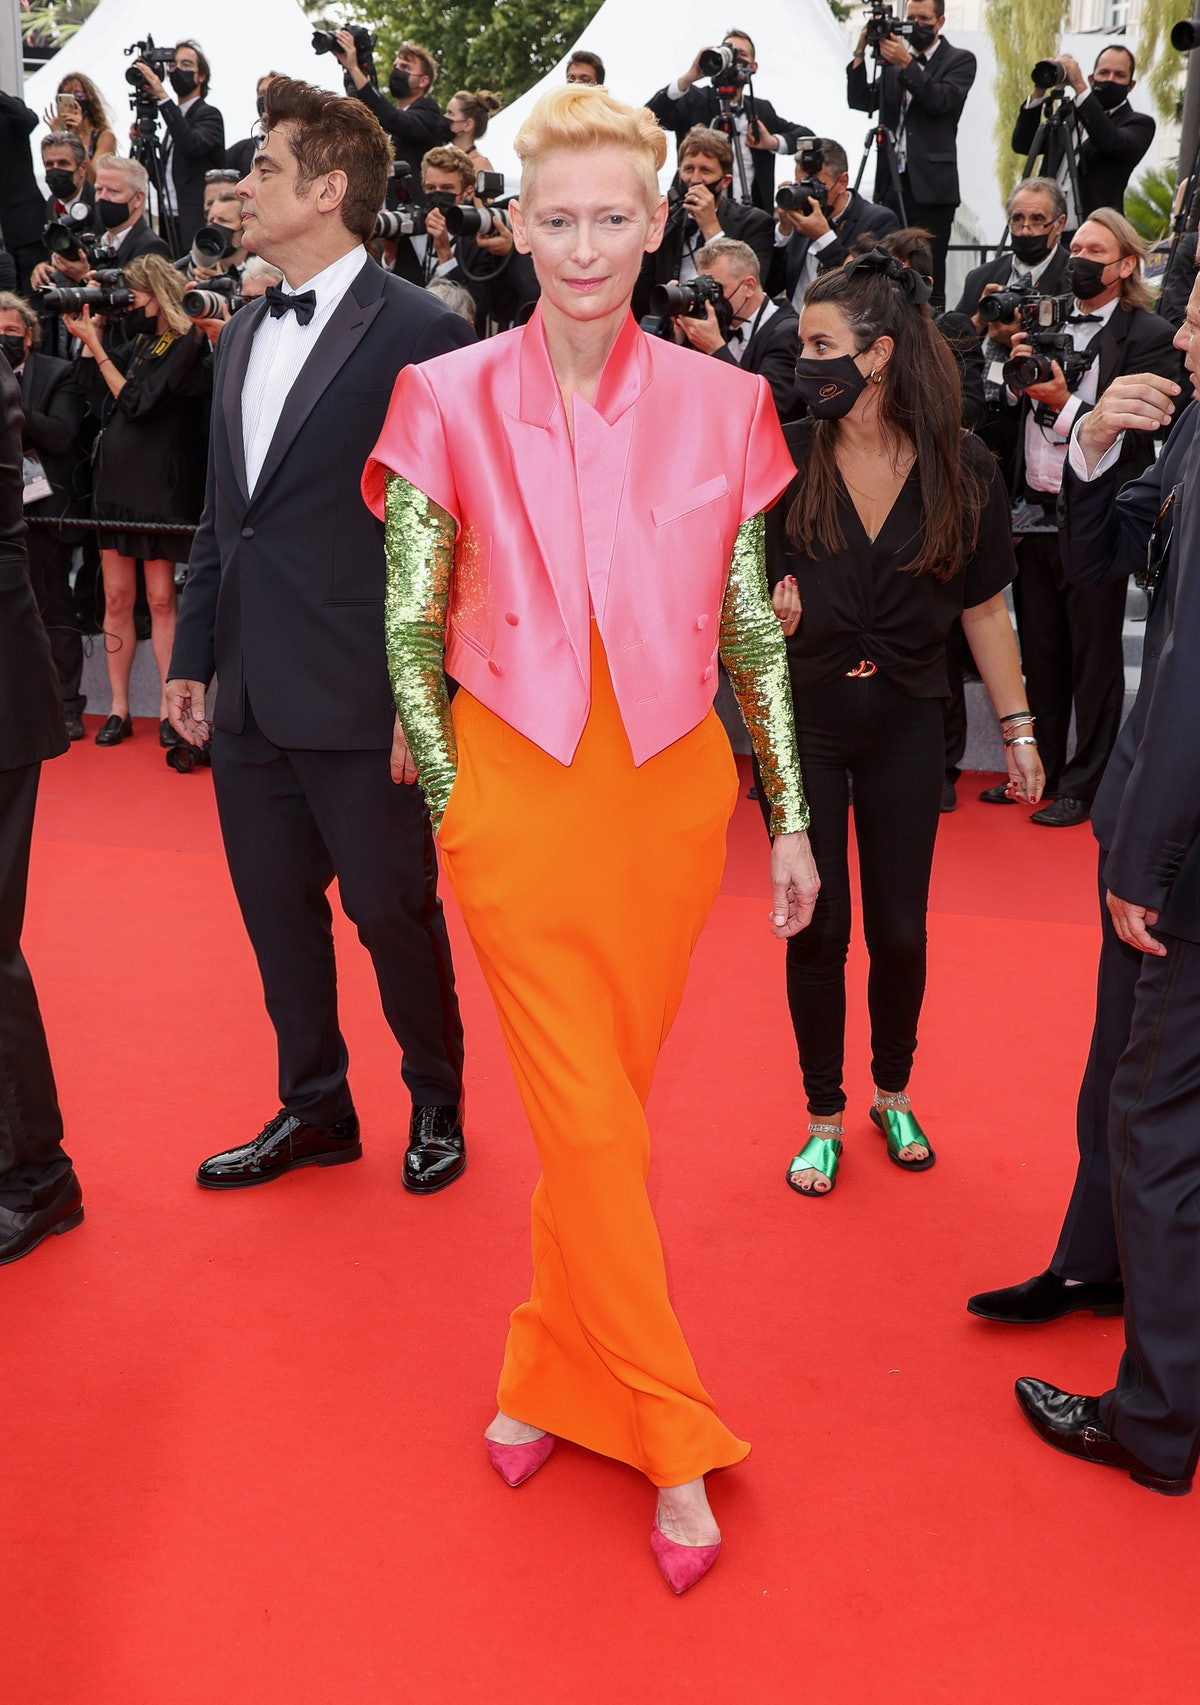 Tilda Swinton wearing a shiny gold pink and orange ensemble